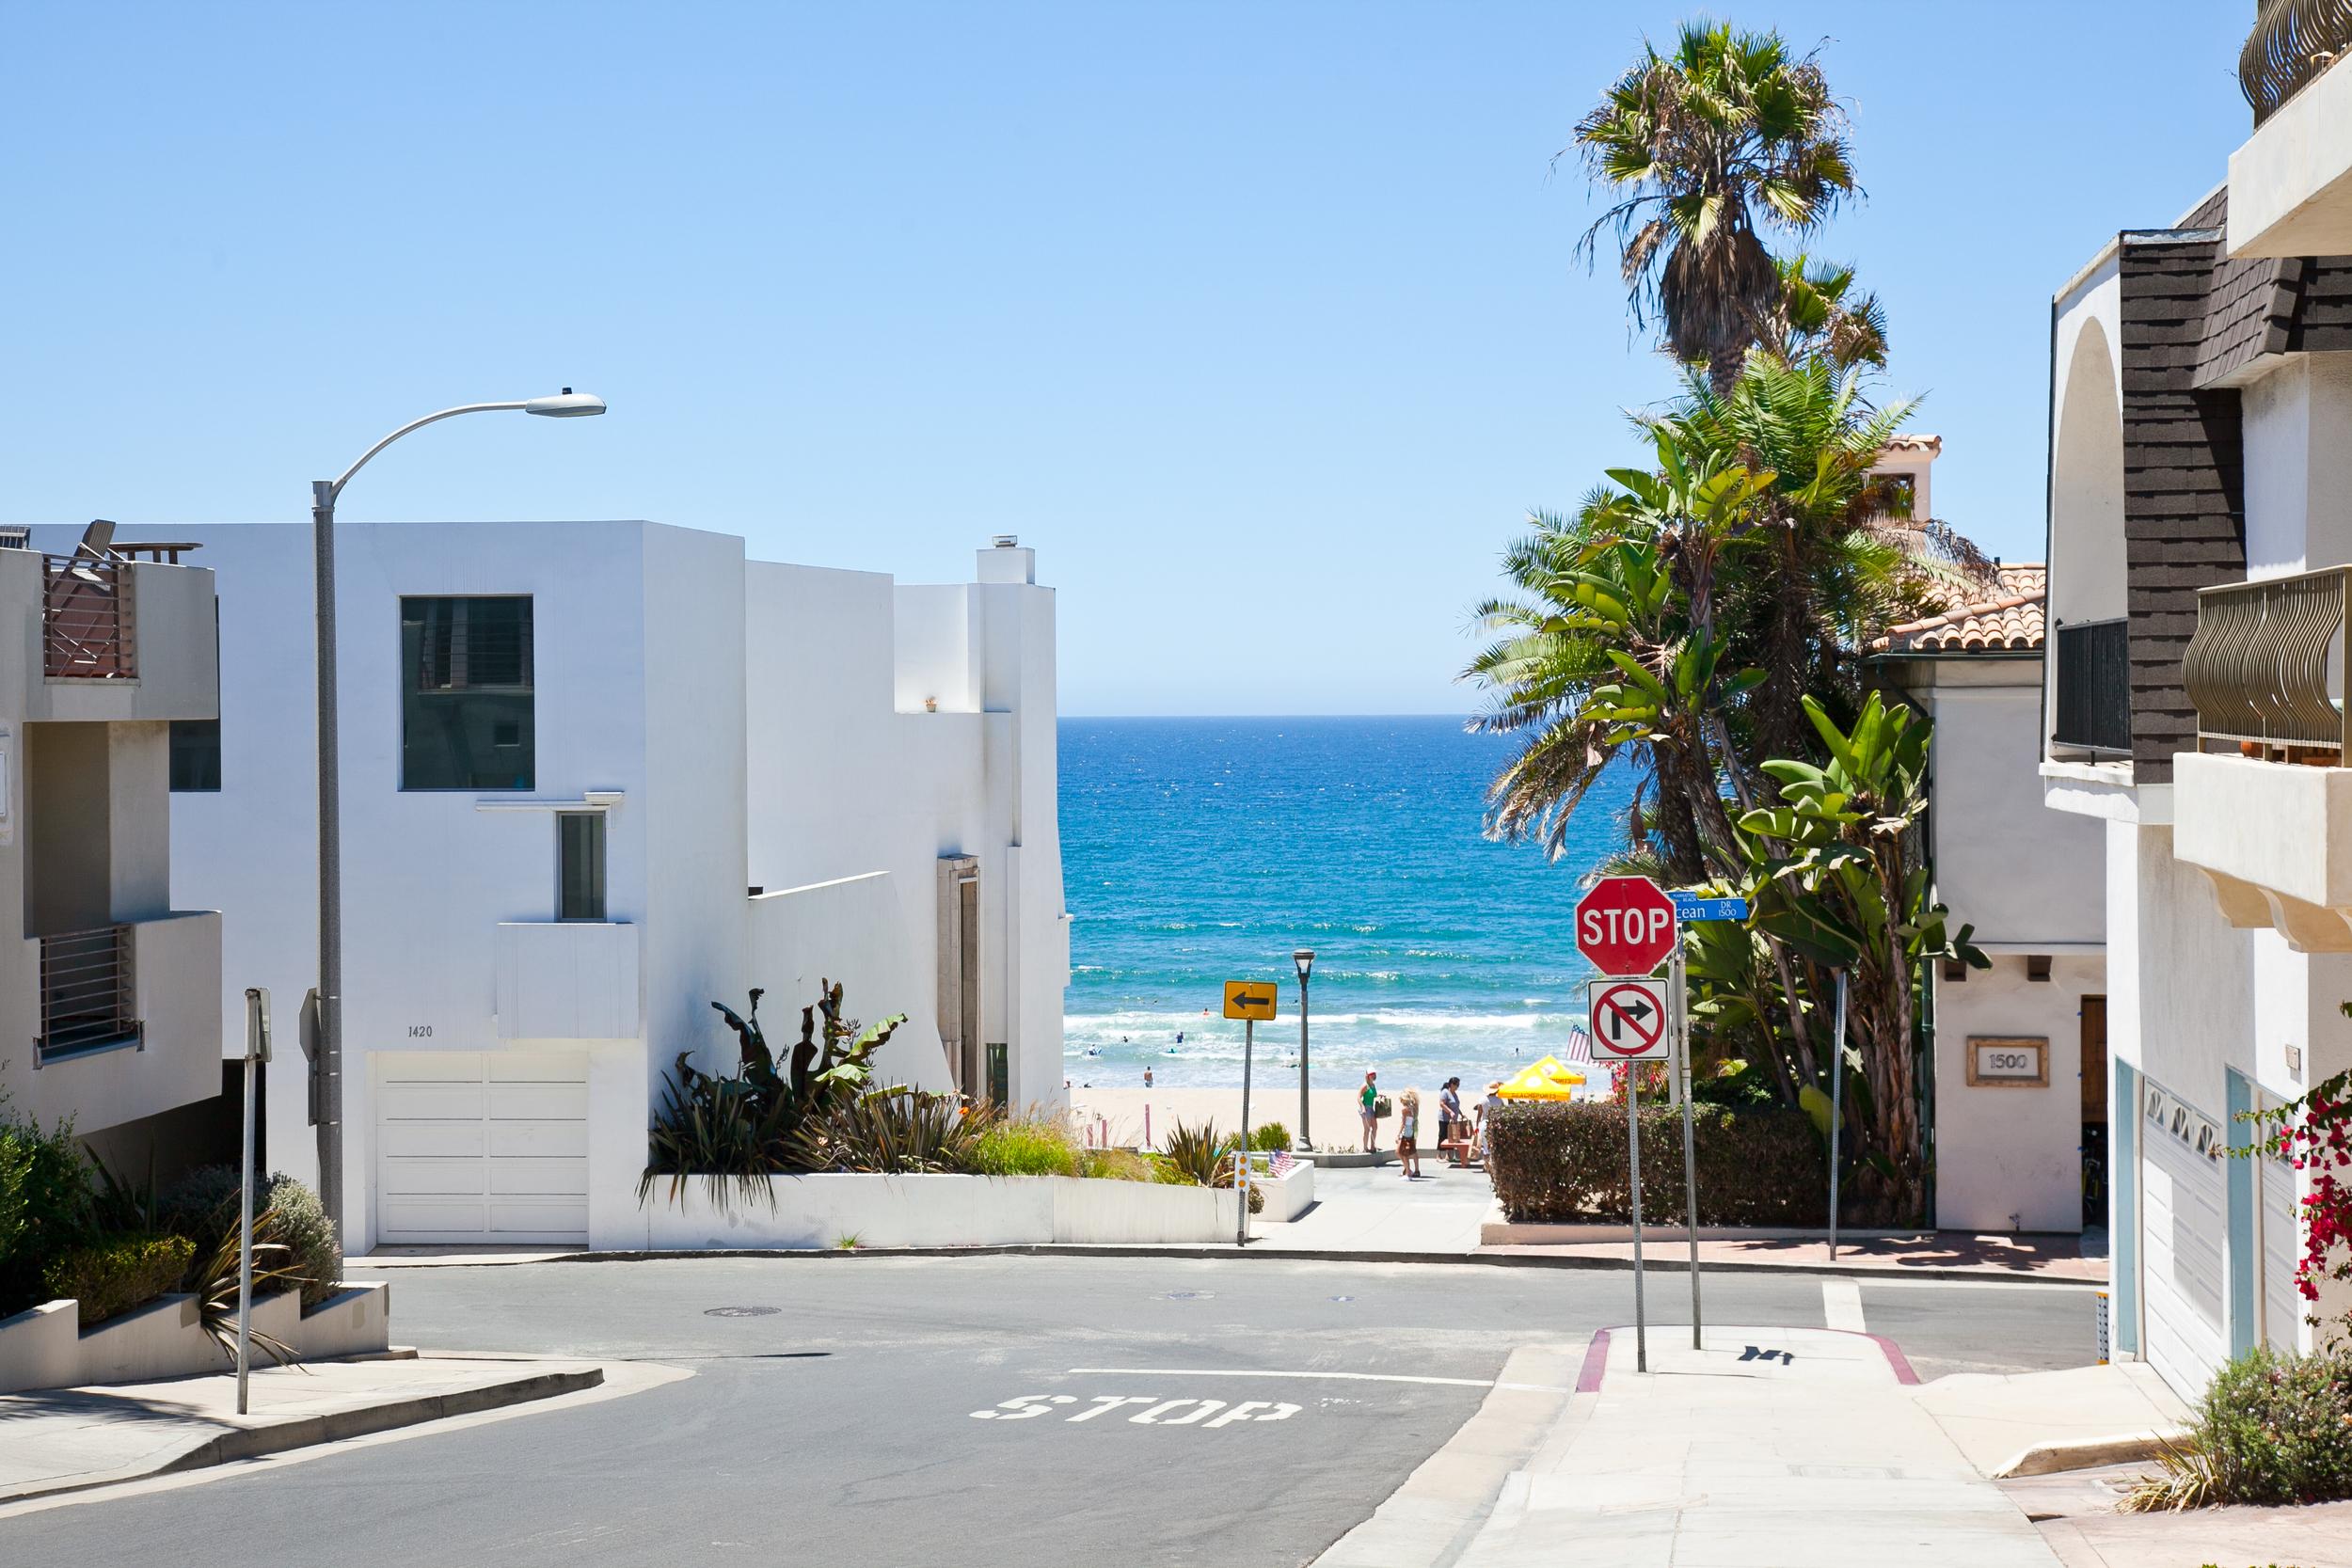 trisa-taro-street-manhattan-beach-LA.jpg